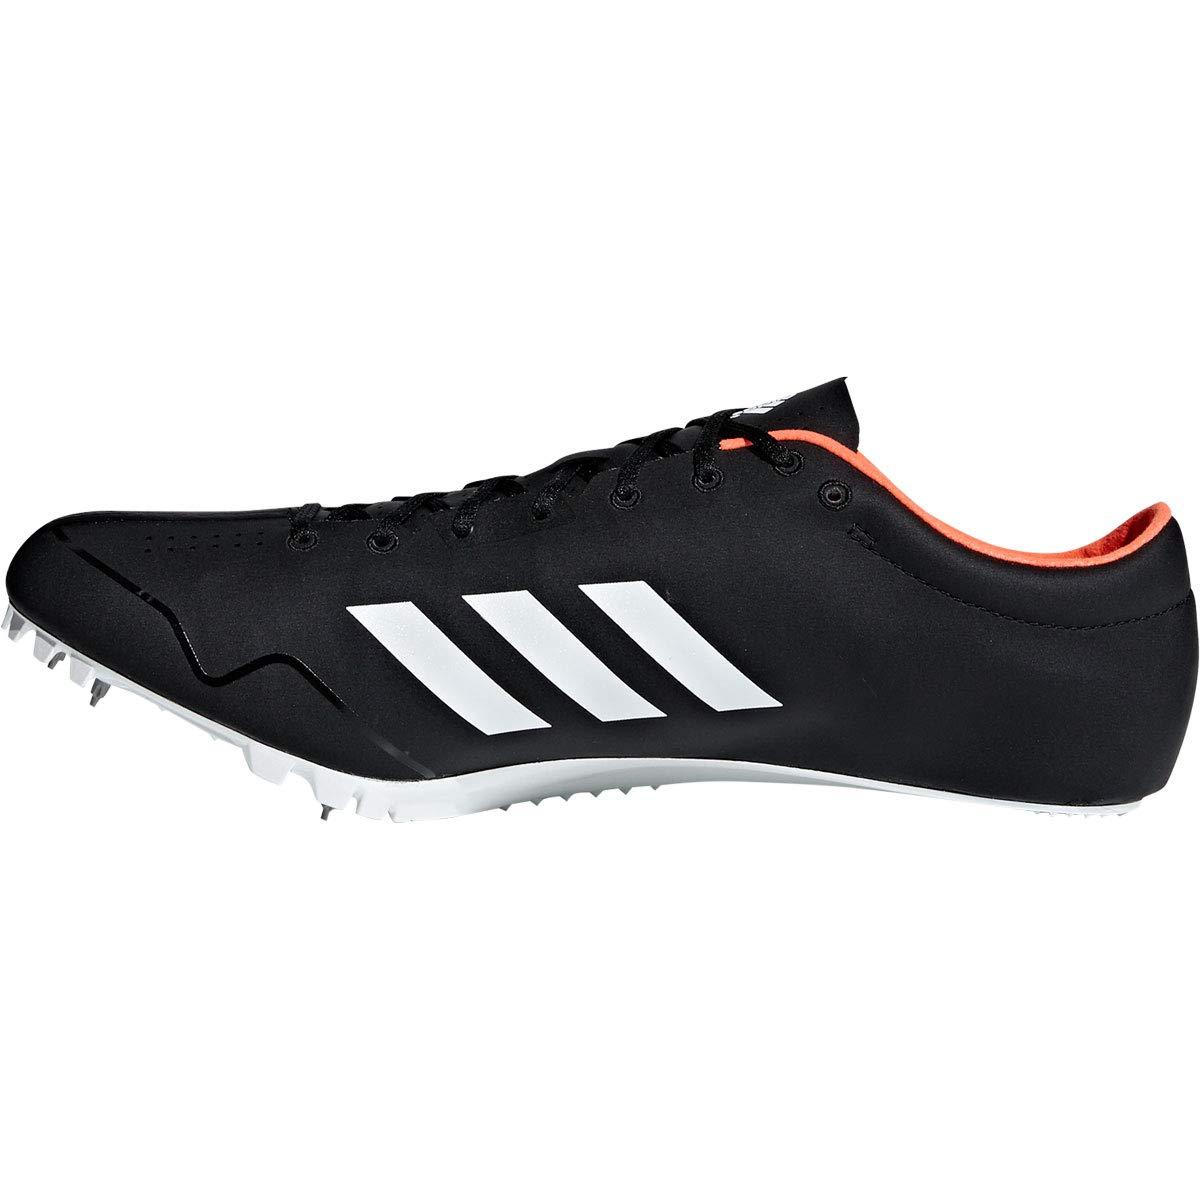 Adizero Erwachsene Prime Adidas Unisex Spike Sprint sdQthxrC